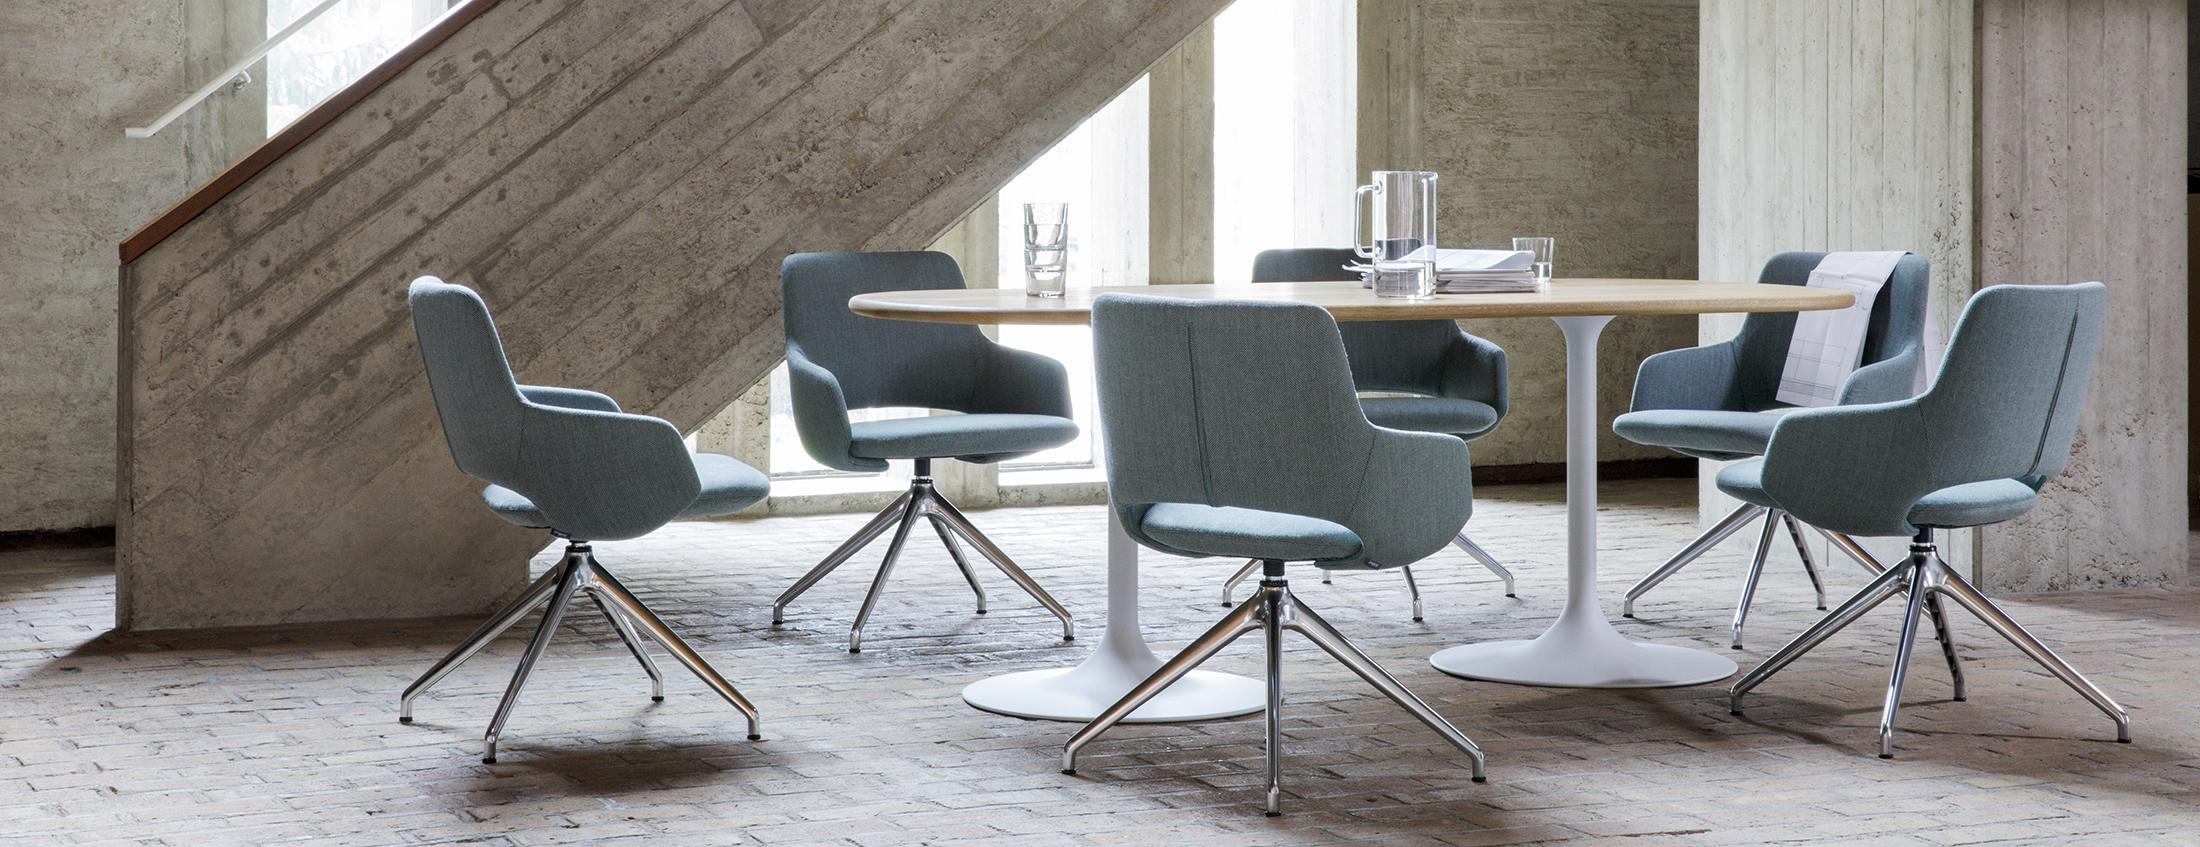 Artifort Design Salontafel.Gentle Landscapes Jima Clarion